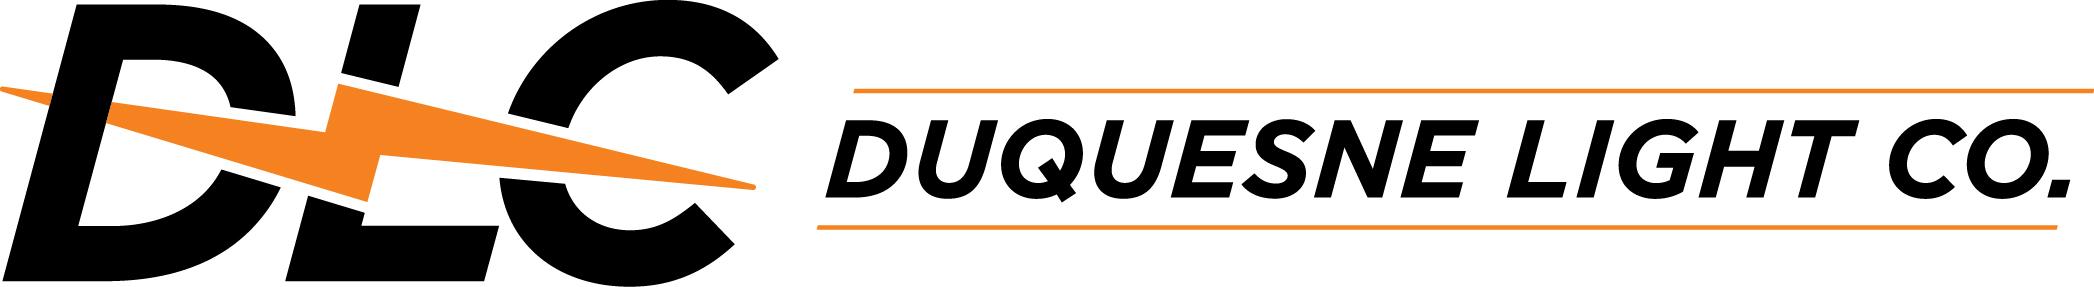 dlc-logo-horizontal-print.jpg